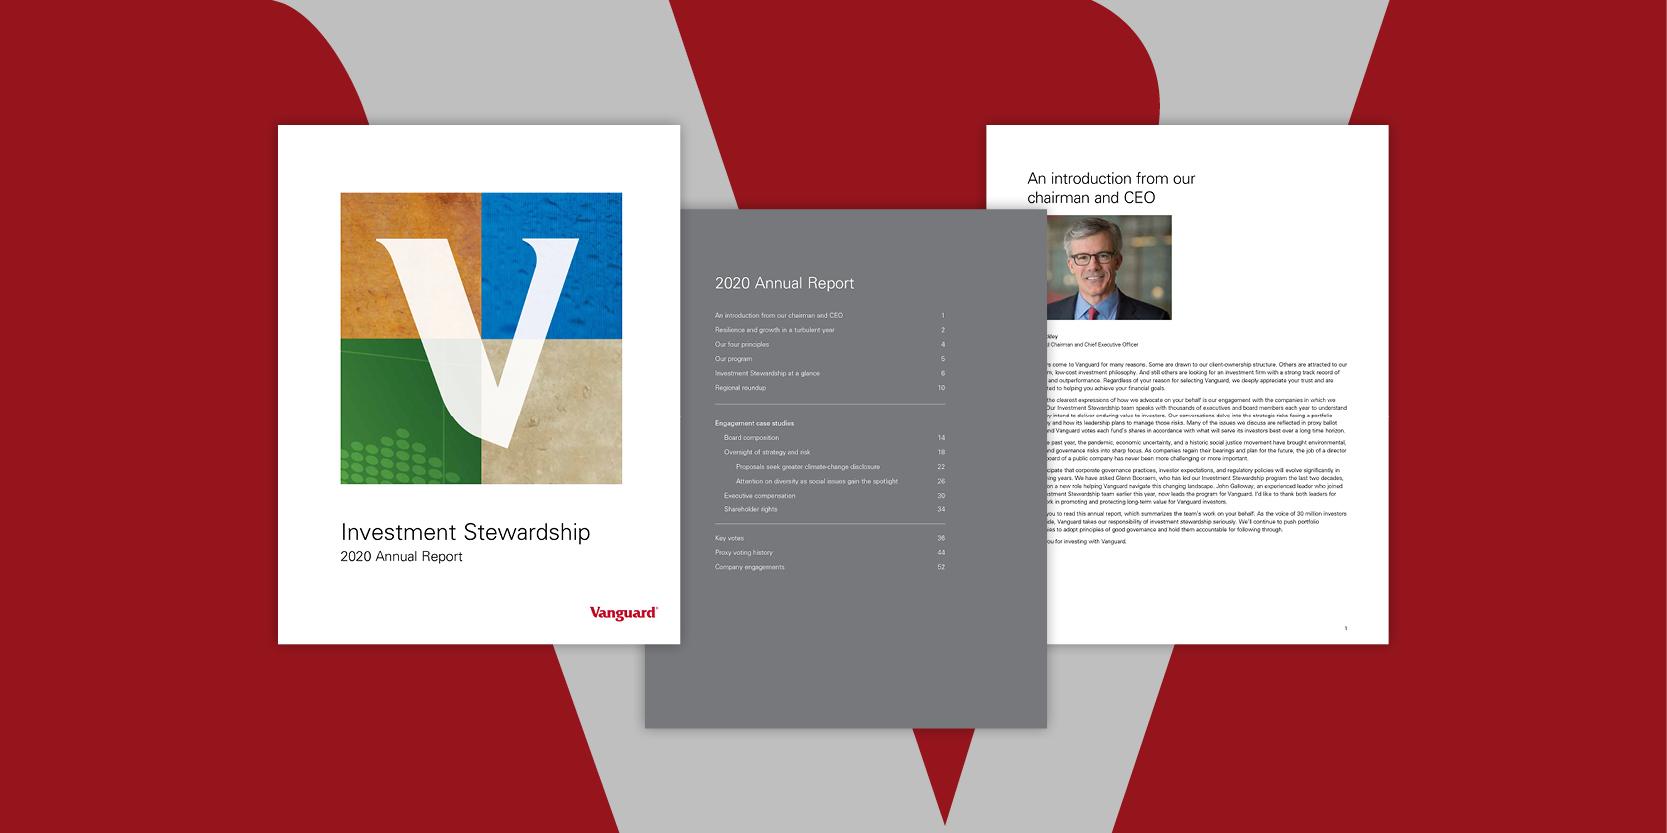 How Vanguard advocates on behalf of investors